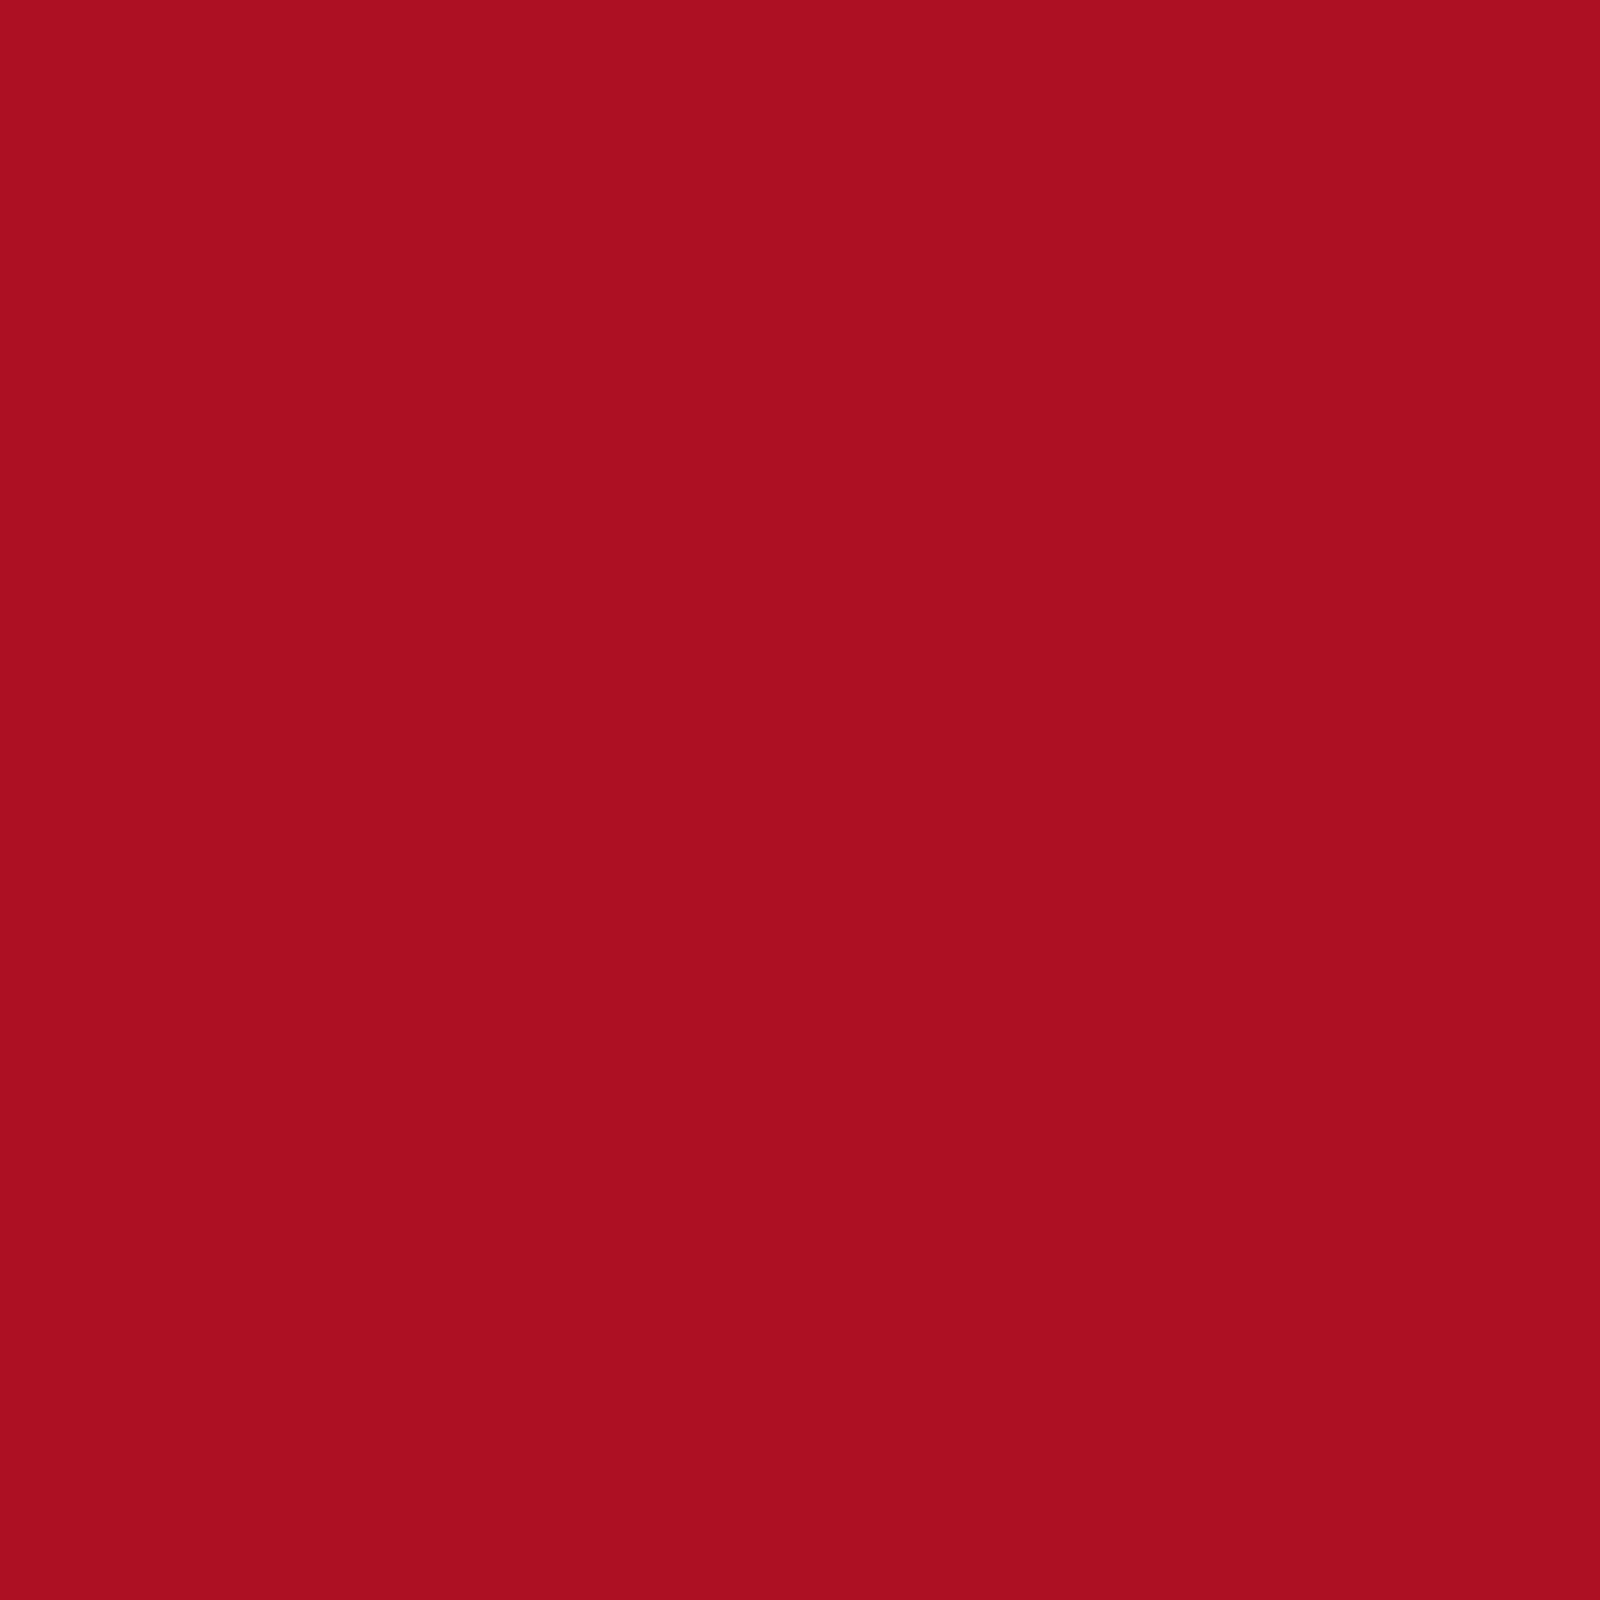 D c fix klebefolie lack signalrot rot 45x200 cm for Klebefolie rot